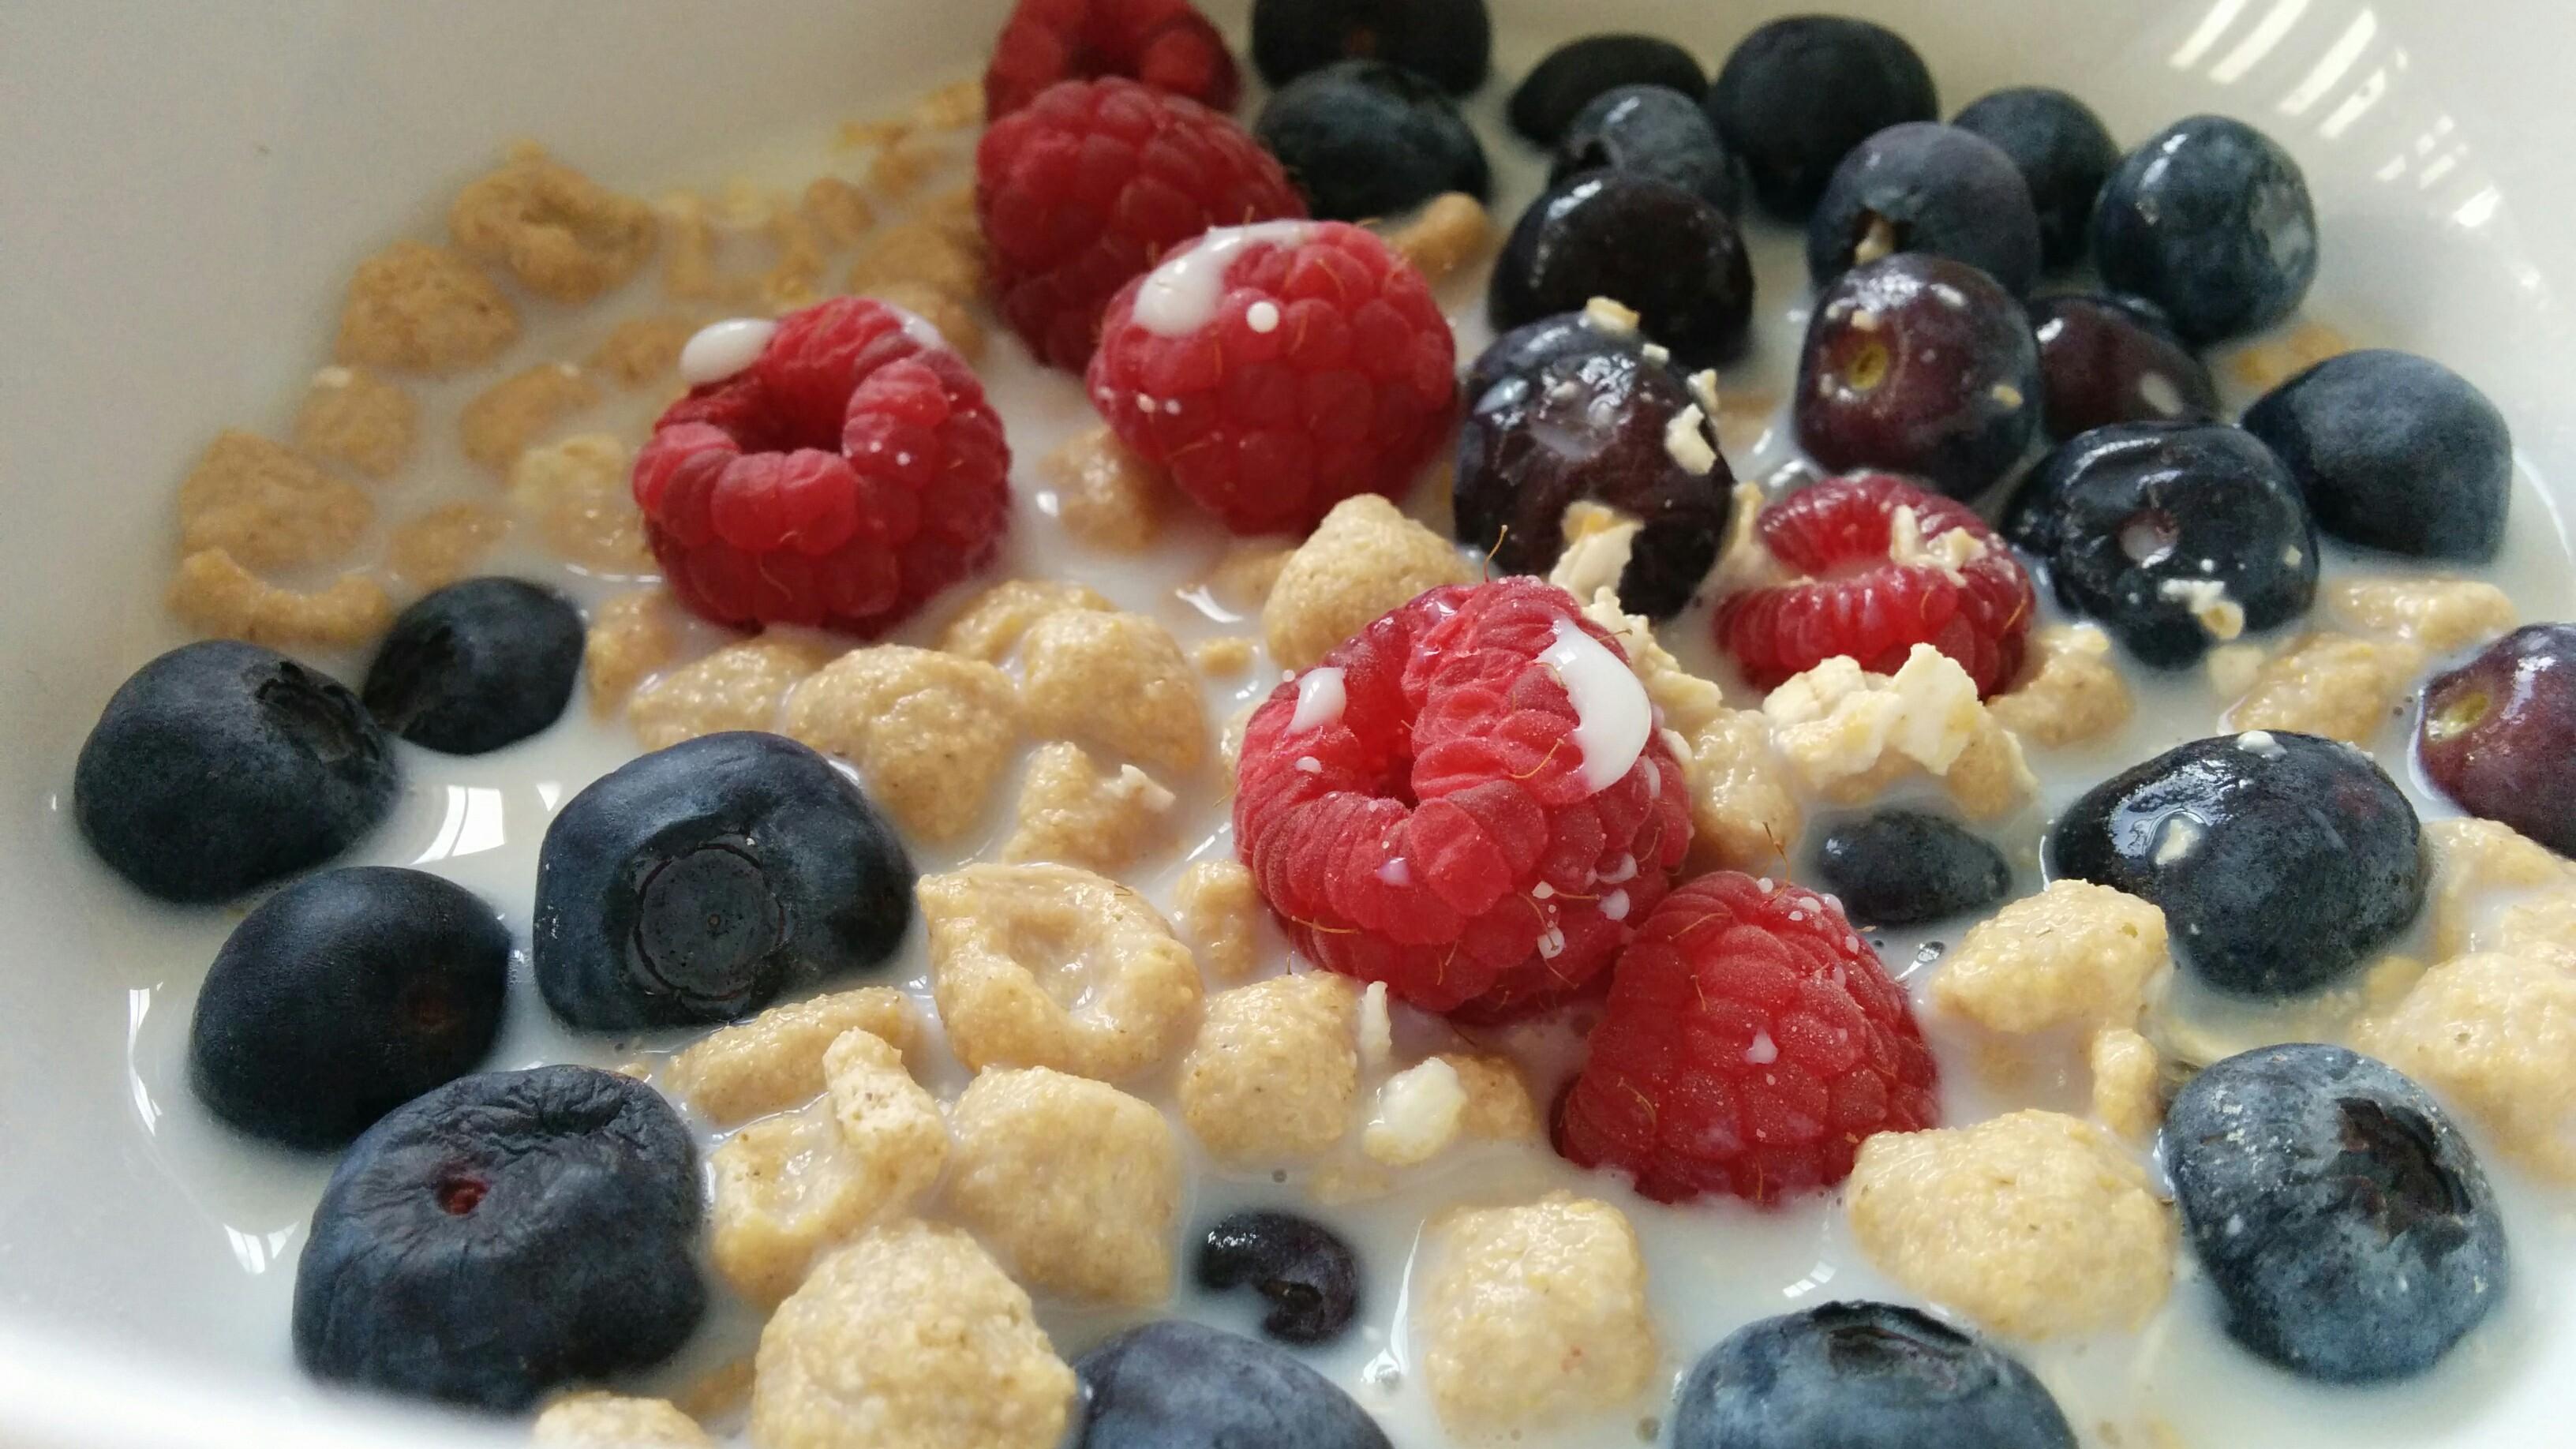 Ernährungstagebuch | Februar Woche I